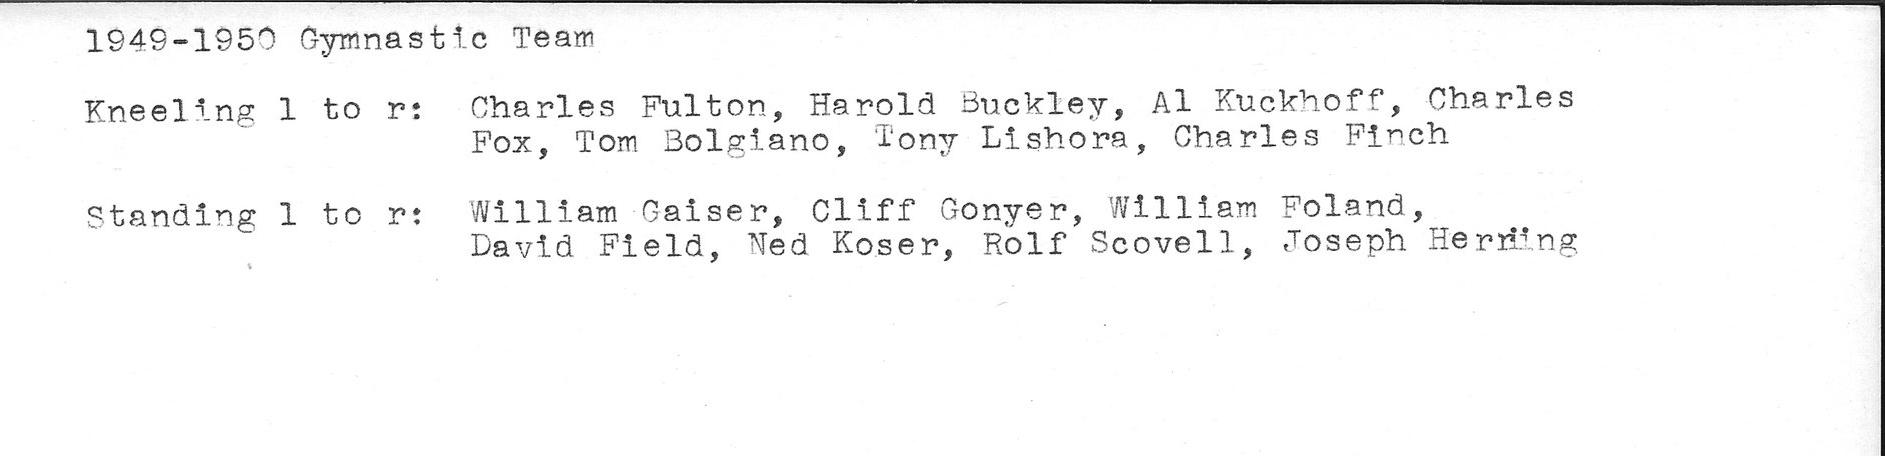 1949-1950 Gymnastics team roster